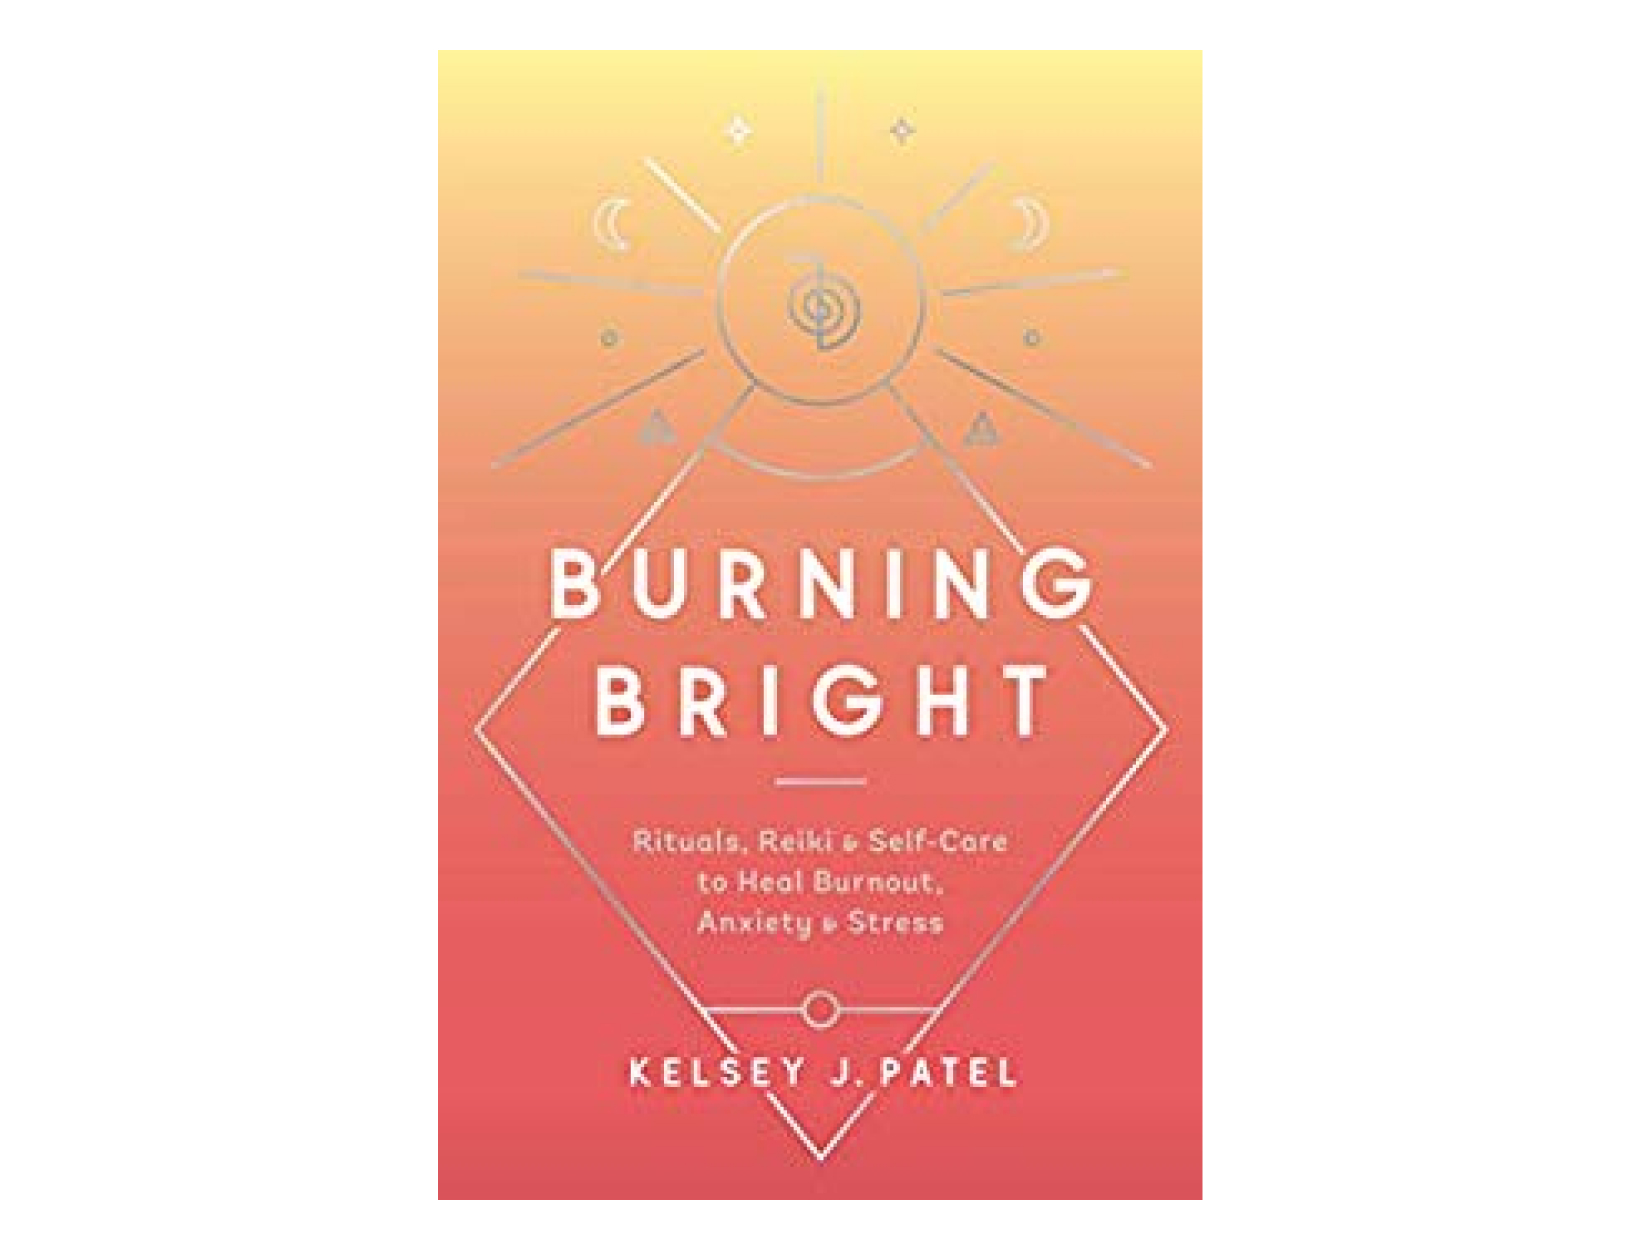 <em>Burning Bright</em> by Kelsey J. Patel